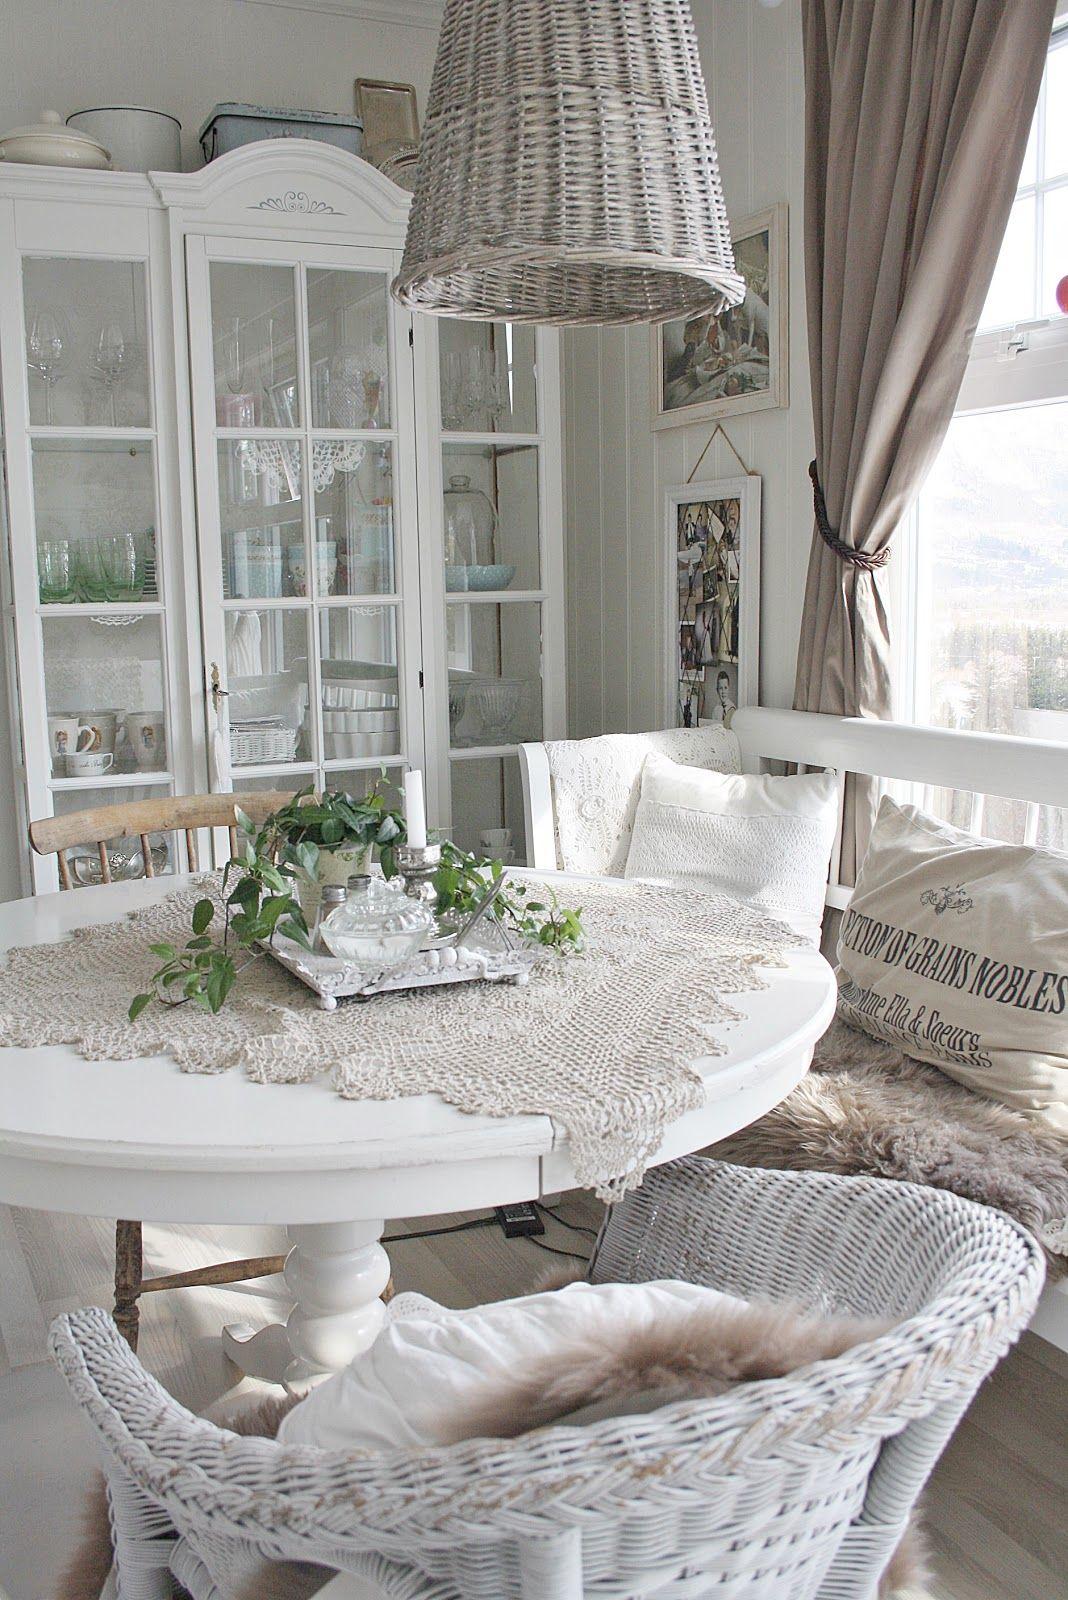 shabby chic | hogar | pinterest | shabby chic wohnzimmer, chic